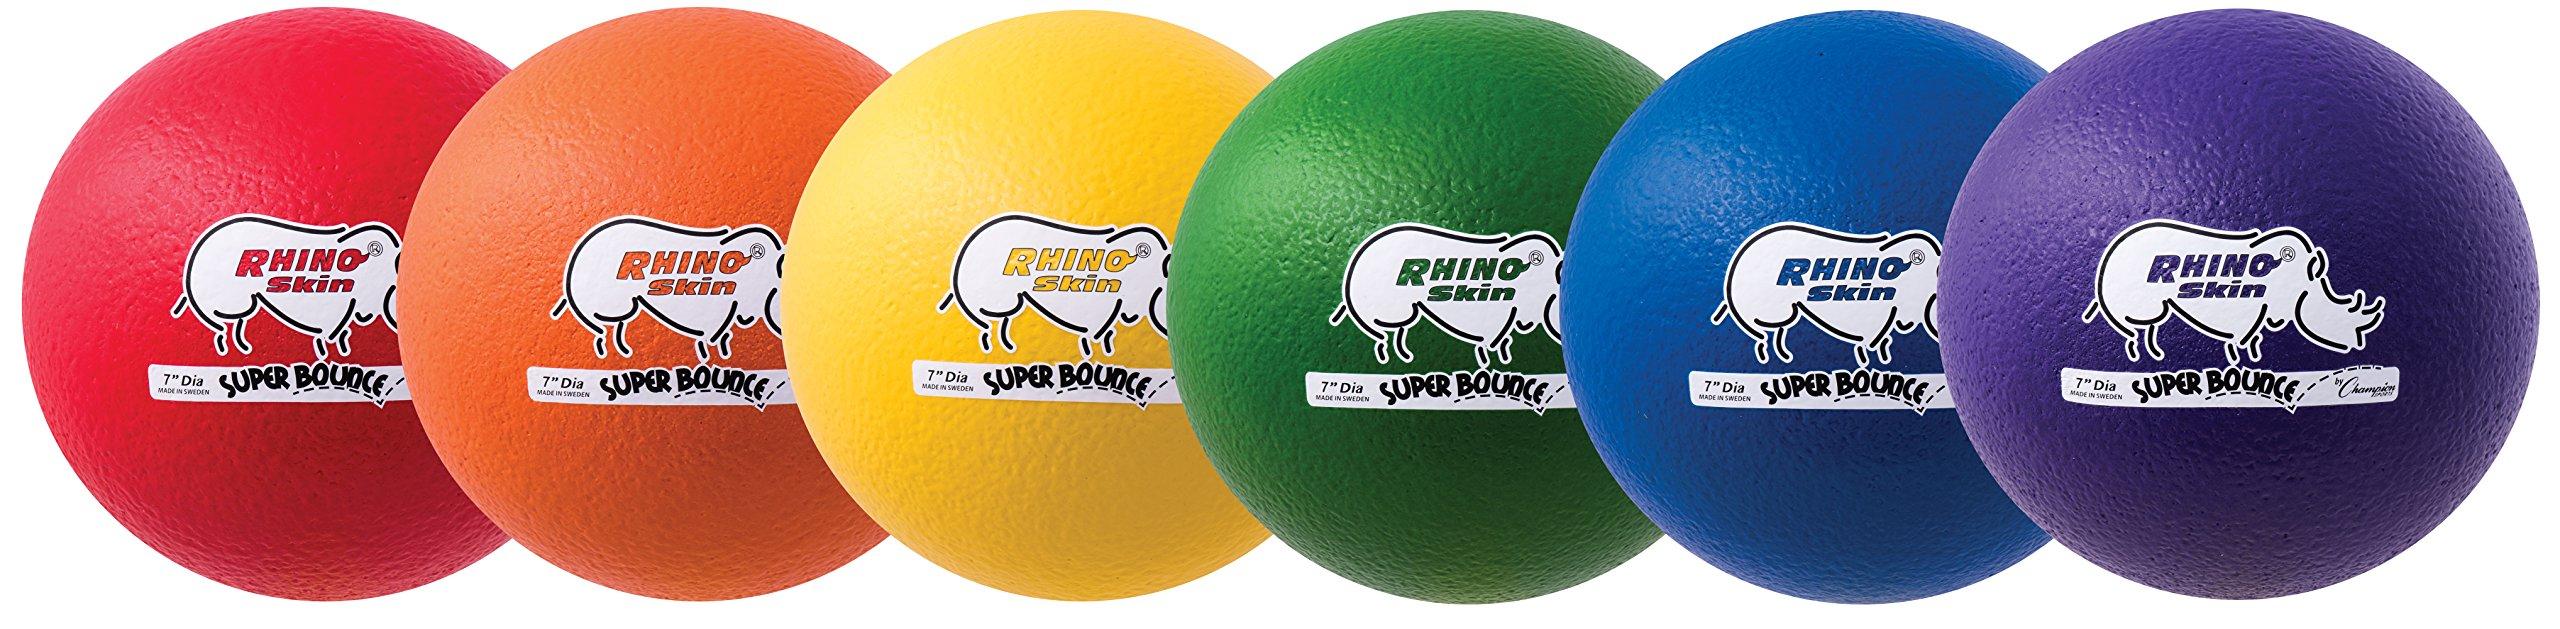 Champion Sports 7 Inch Rhino Skin Super High Bounce Dodgeball Set